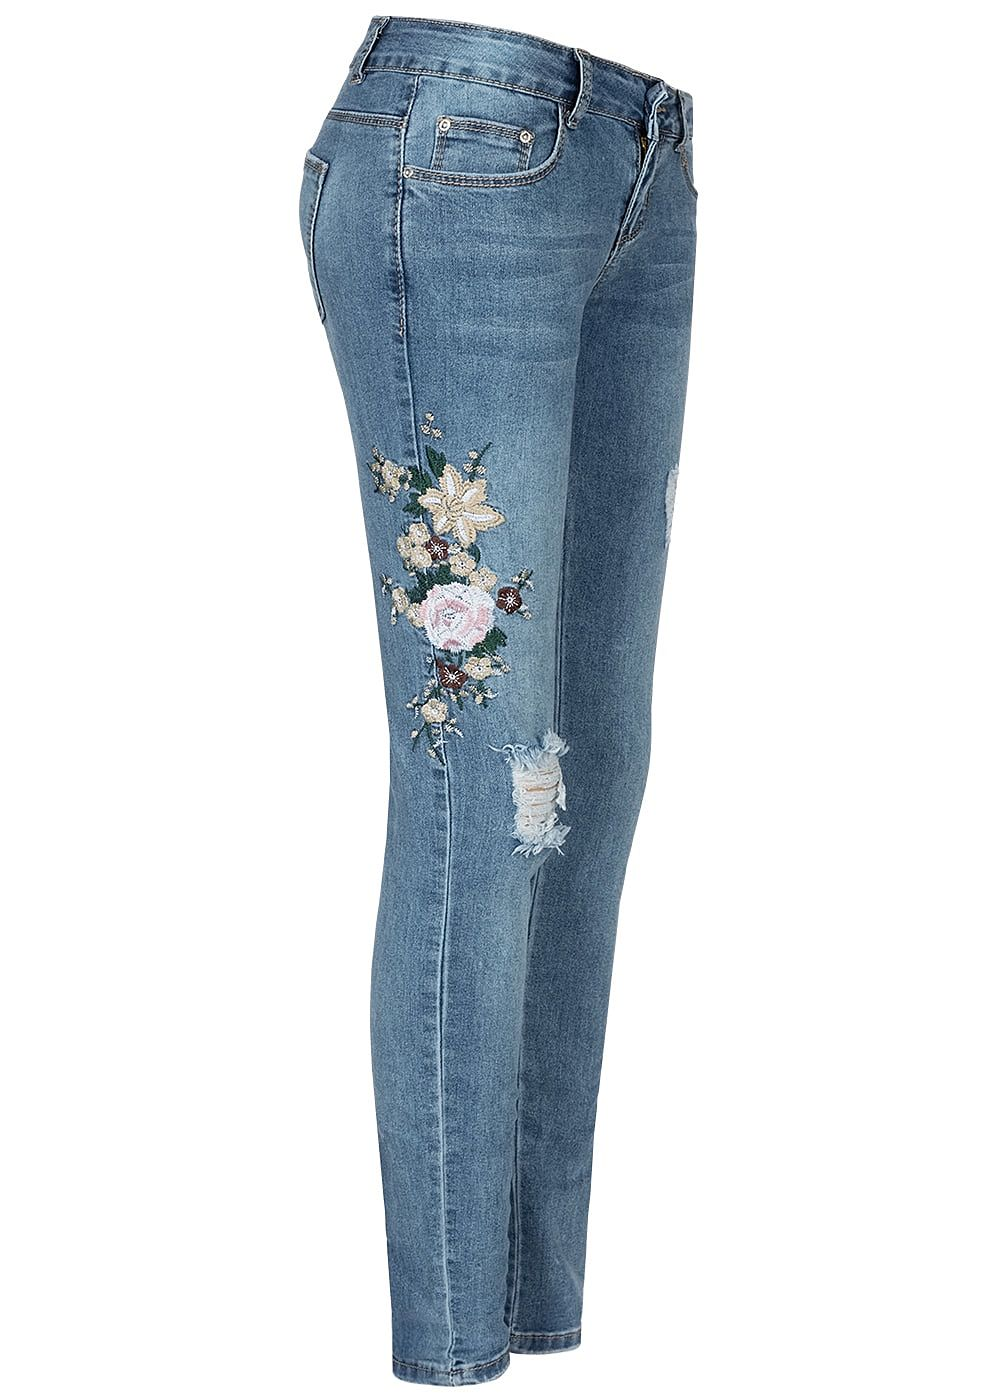 Seventyseven Lifestyle Damen Skinny Jeans 5 Pockets Floral